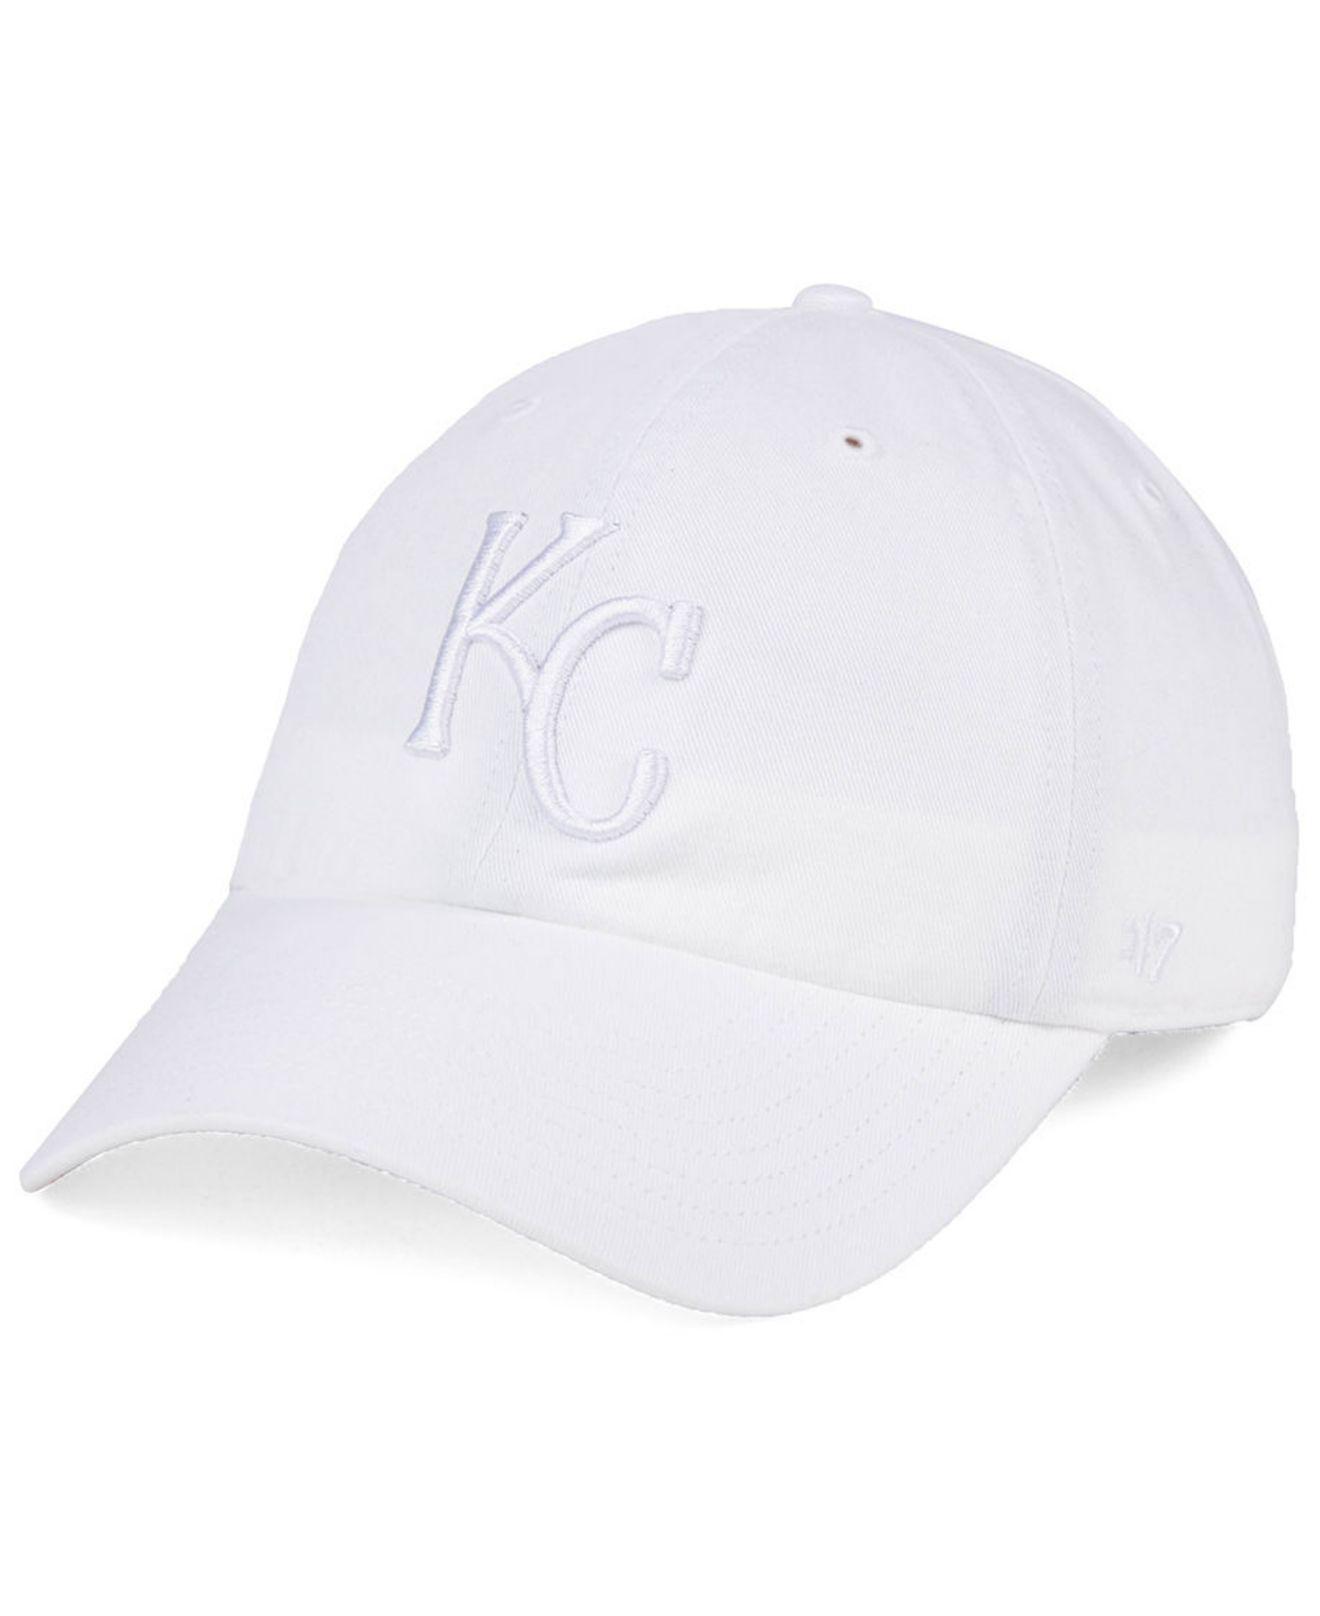 b5f2cadebf2 Lyst - 47 Brand Kansas City Royals White white Clean Up Cap in White ...